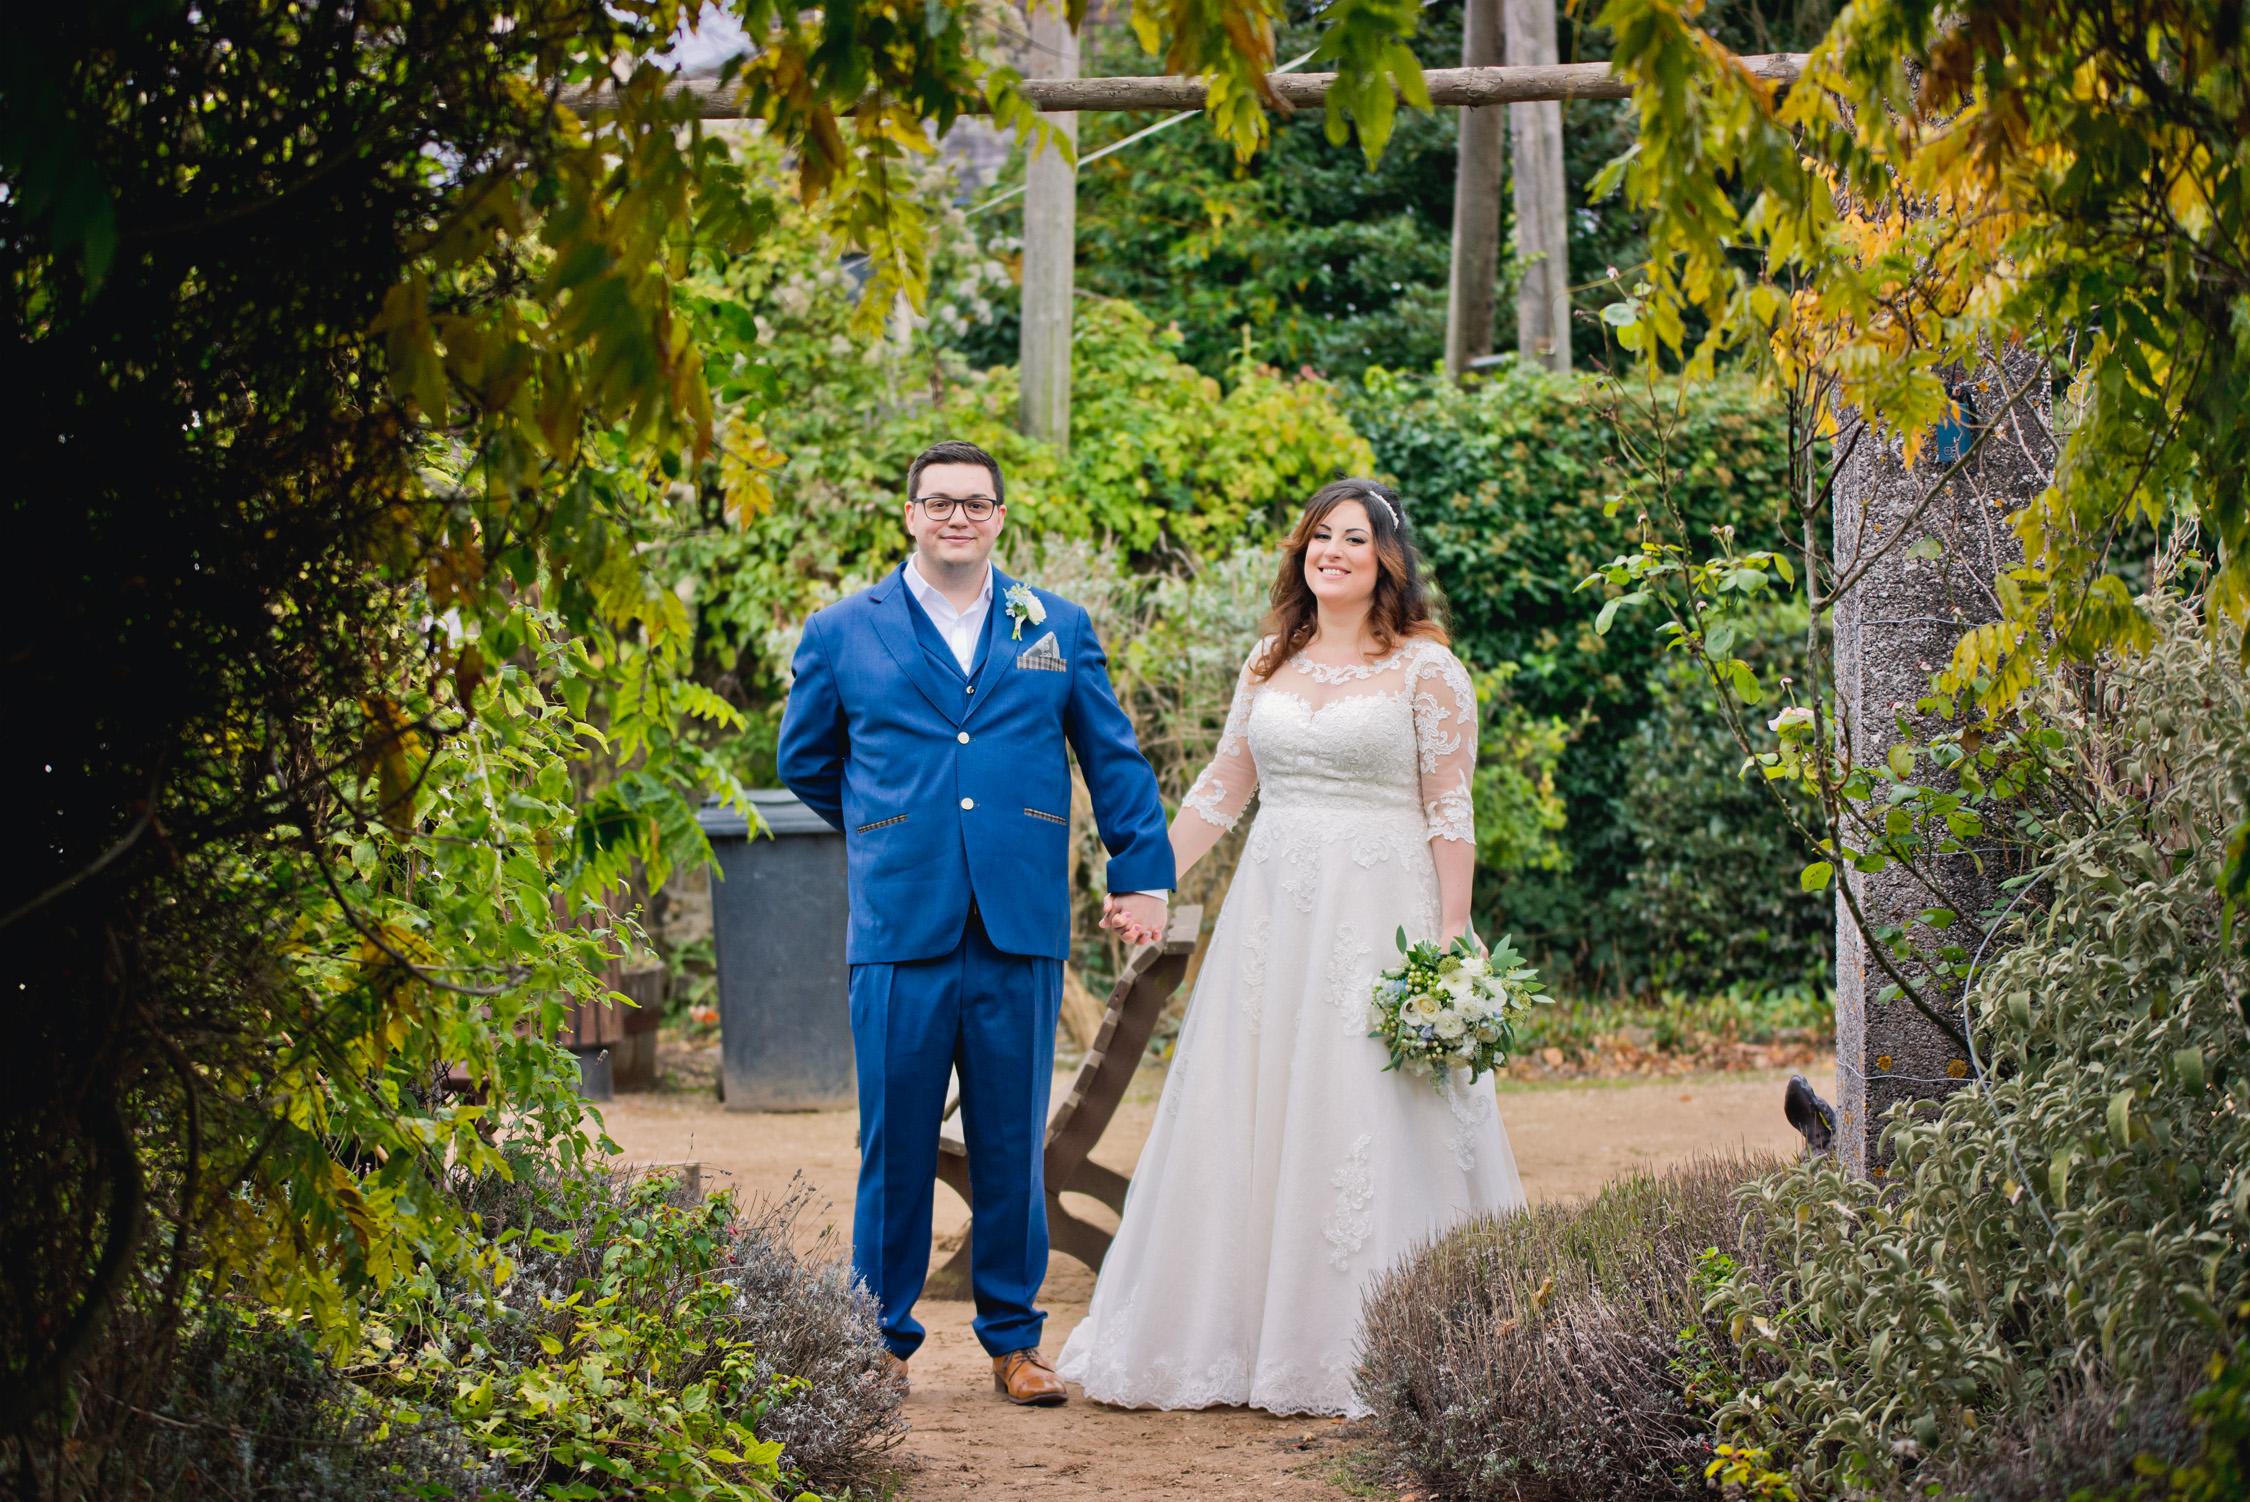 Happy couple wedding garden photo